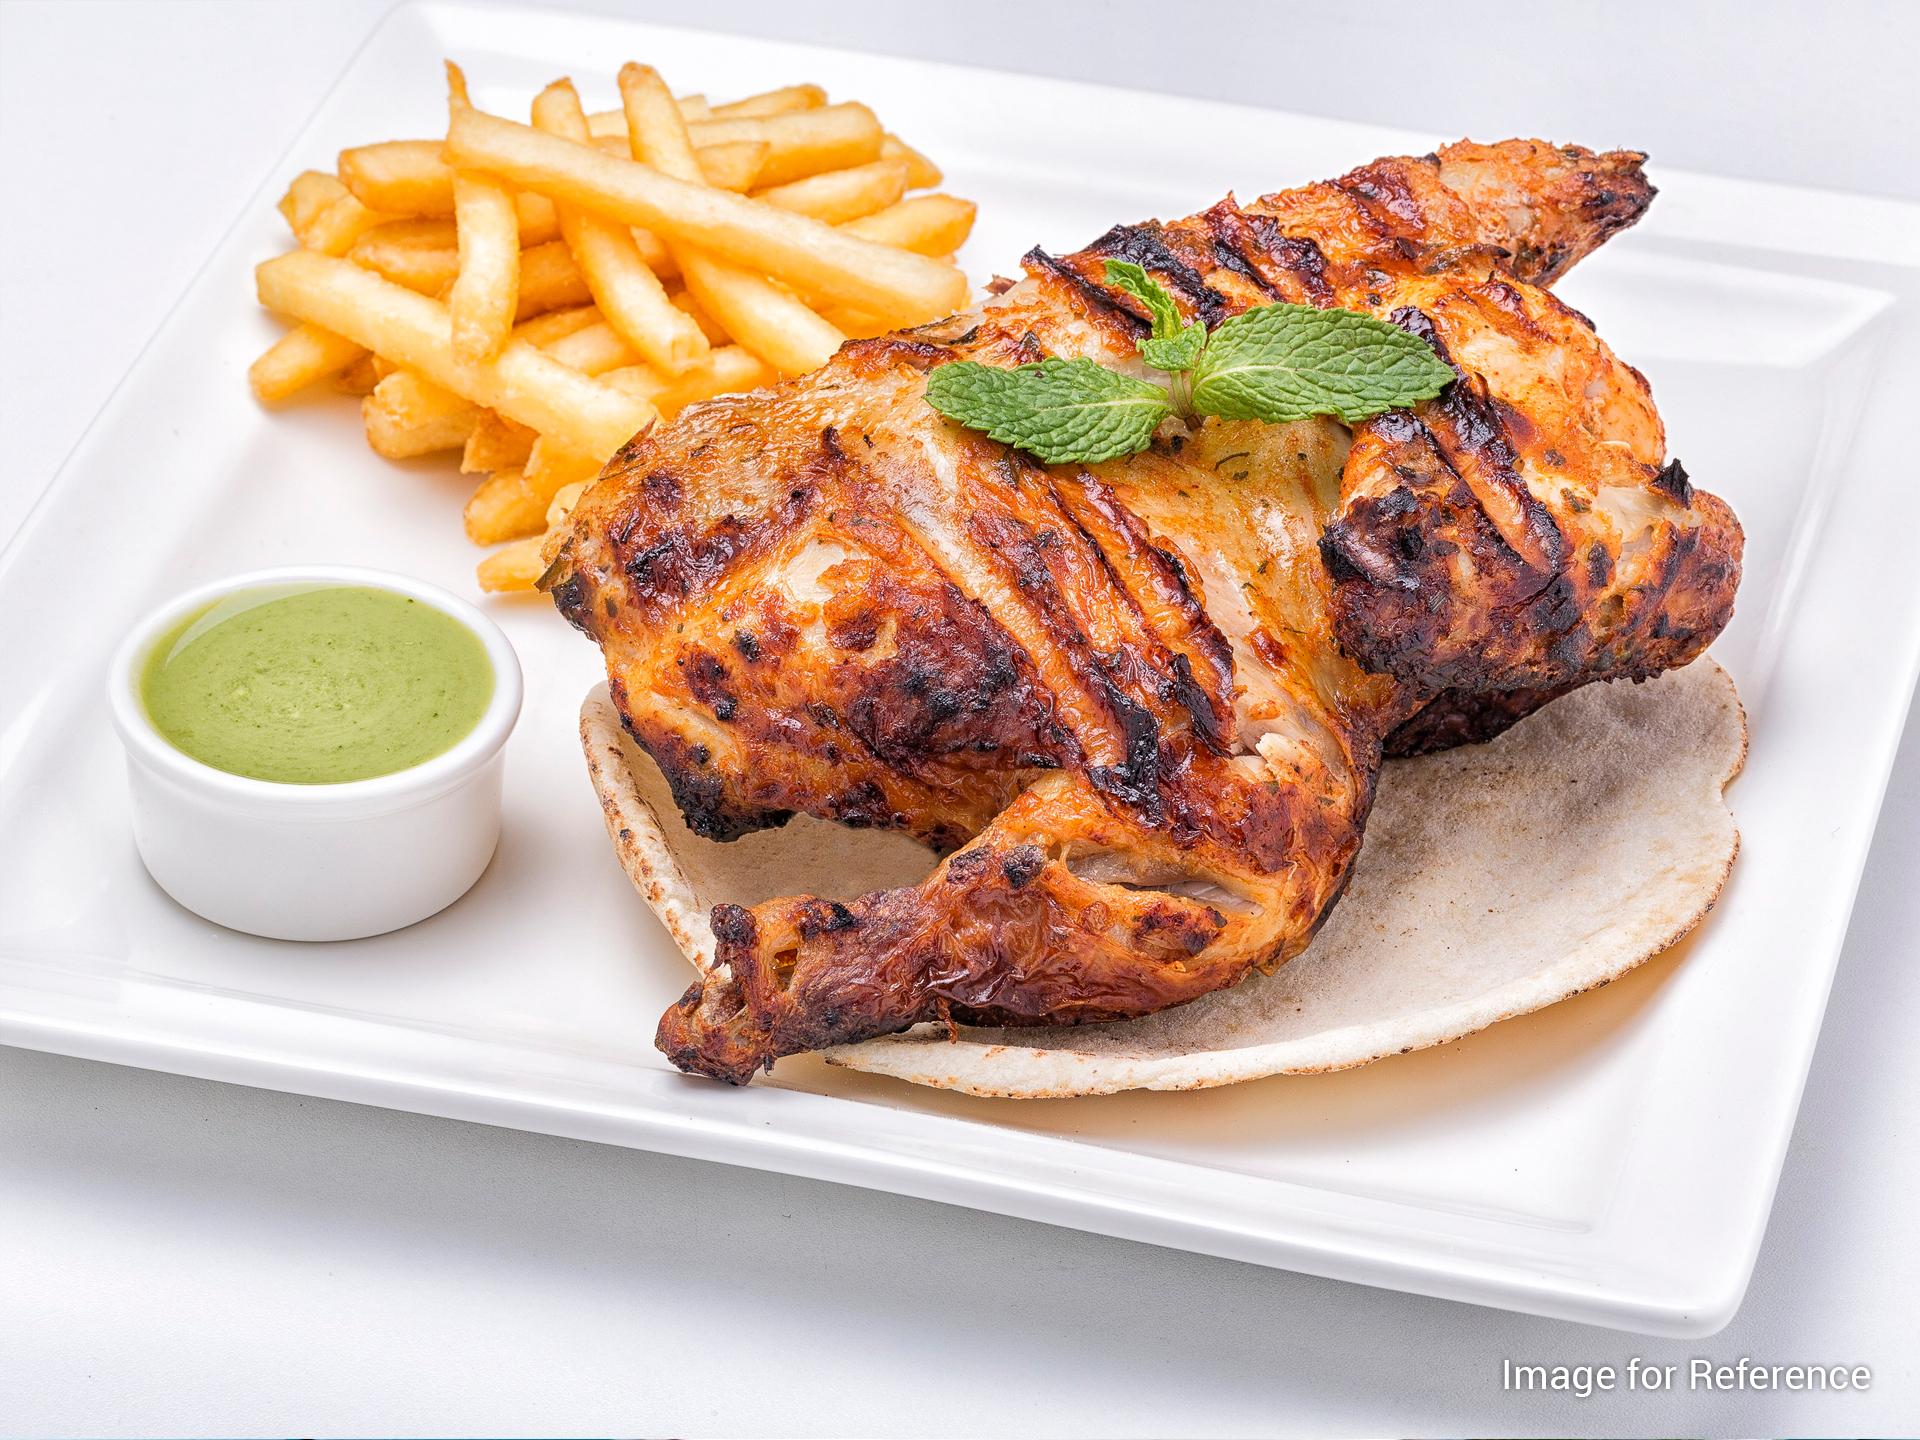 Bluemoon Family Restaurants Ki Grill Chicken Bluemoon Family